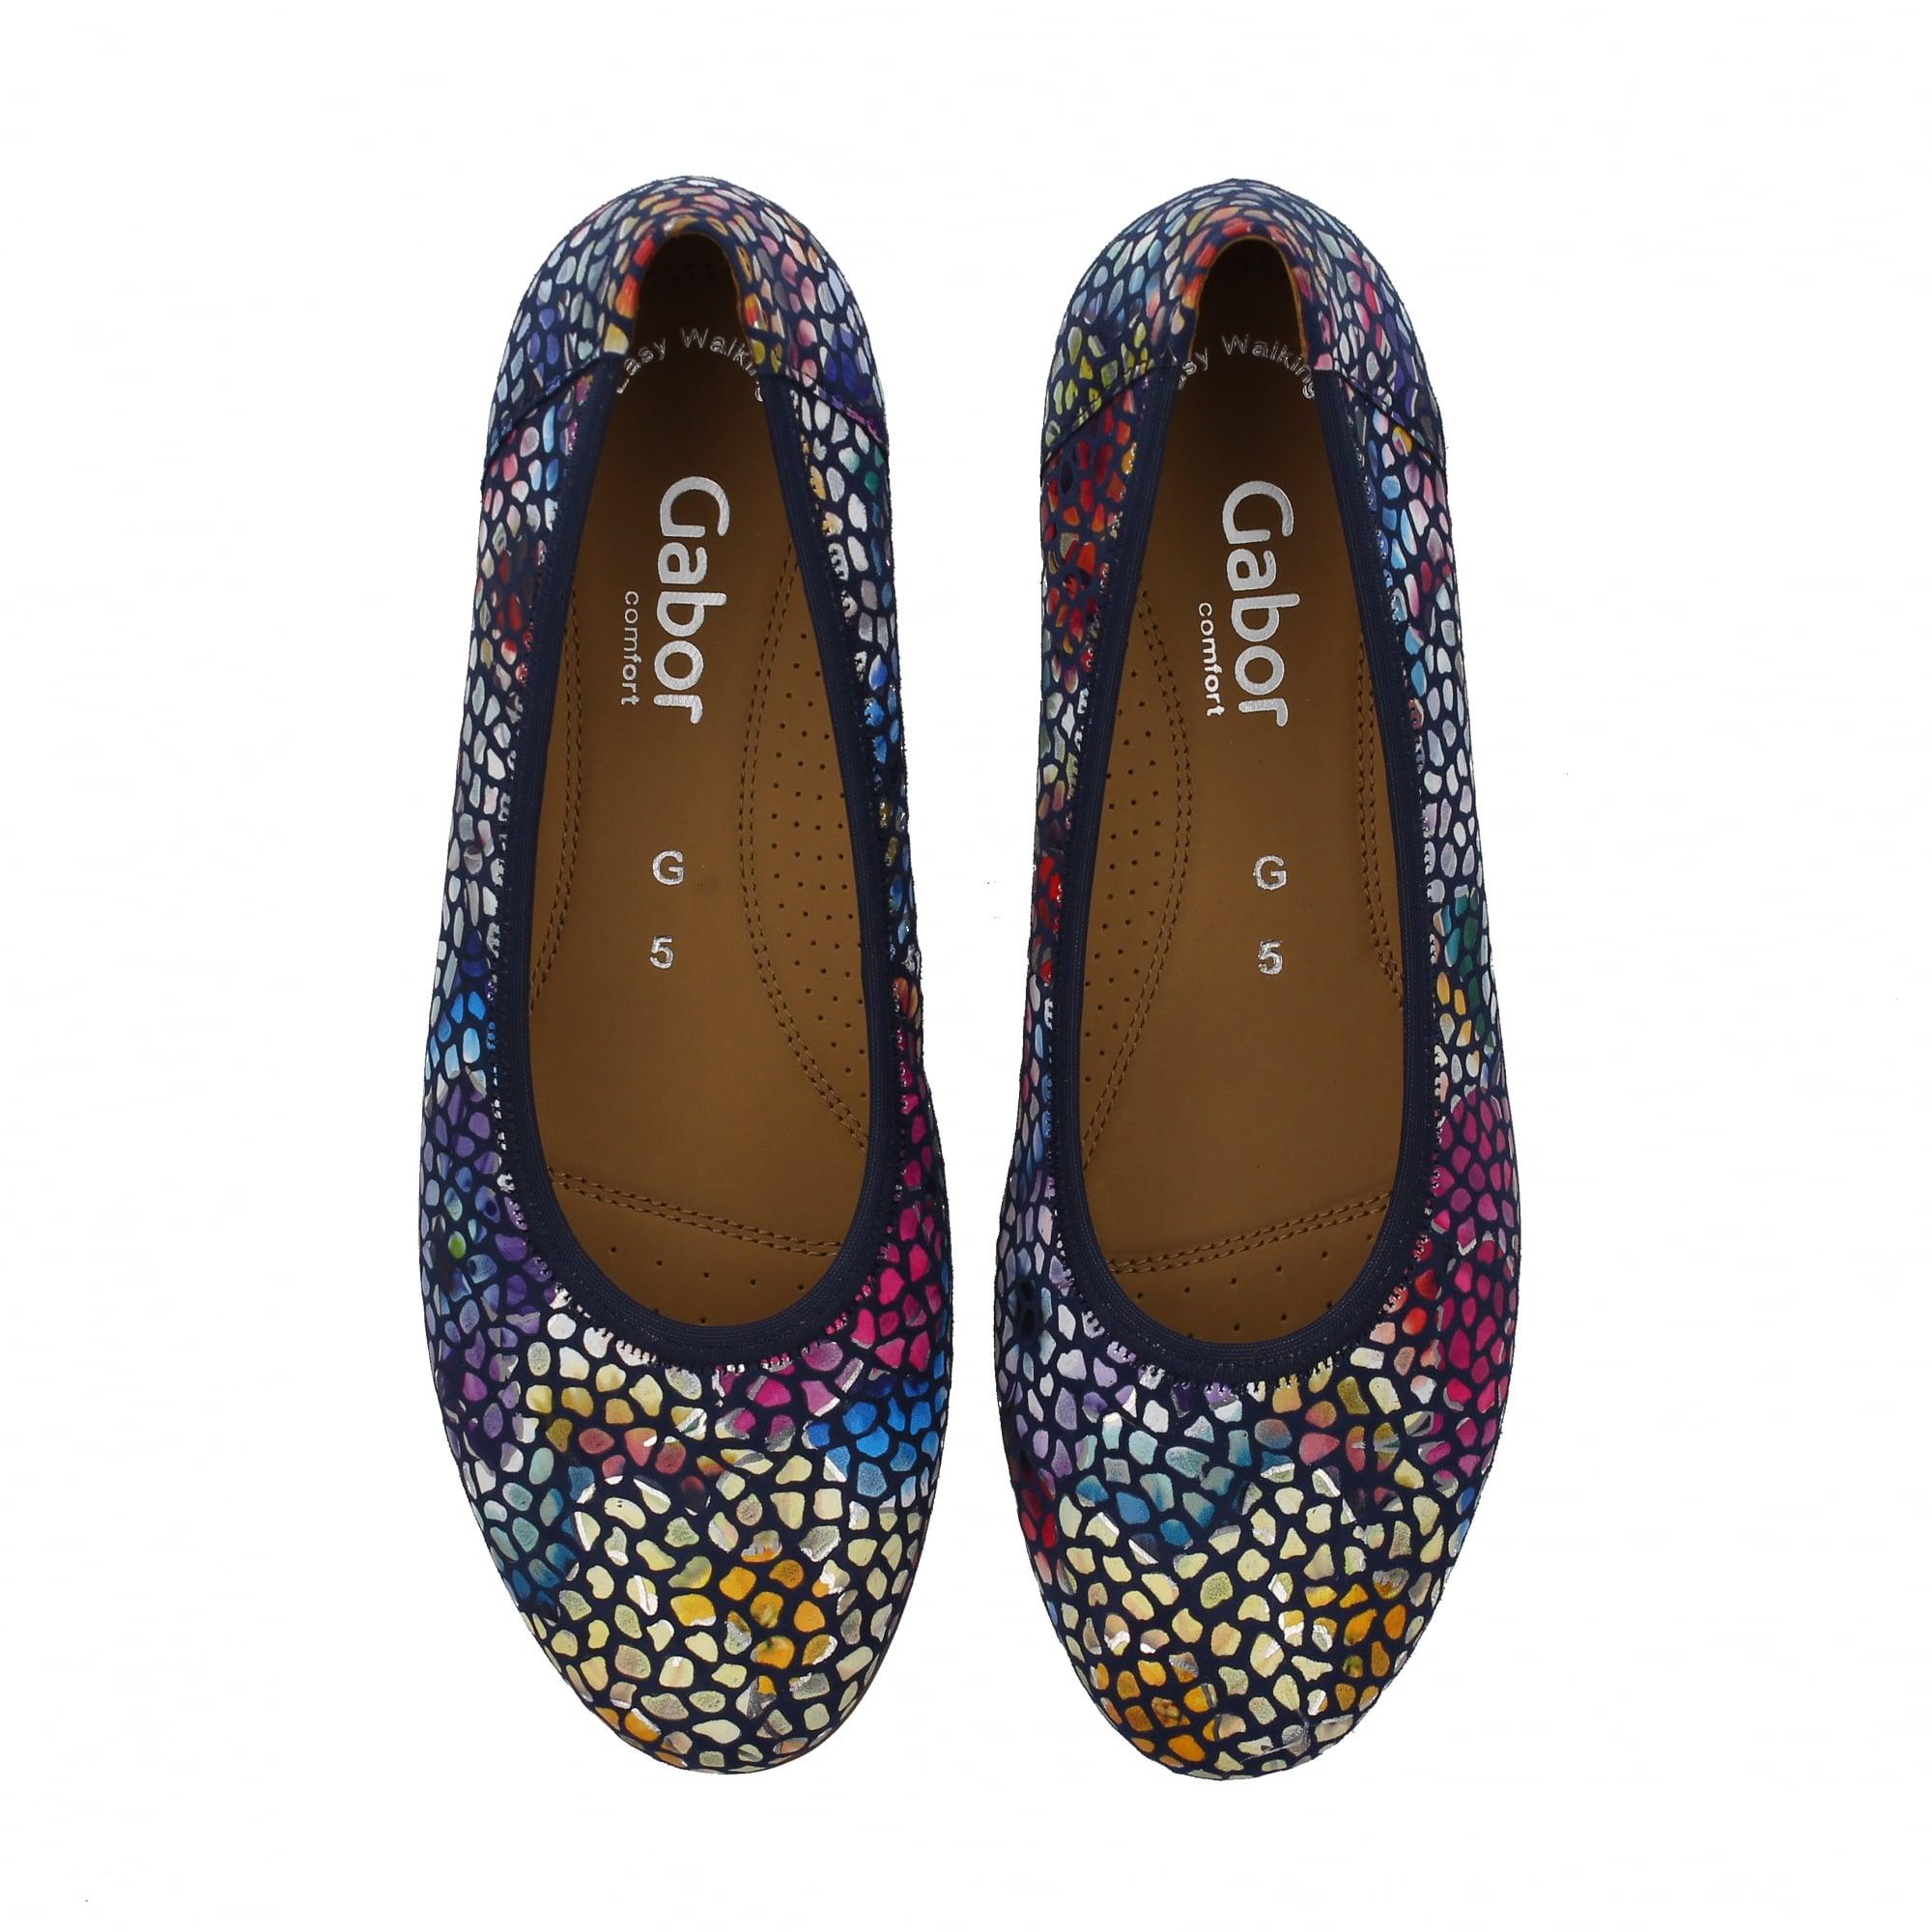 Gabor Splash 82 620 16 Navy Print Womens Pumps   Rogerson Shoes